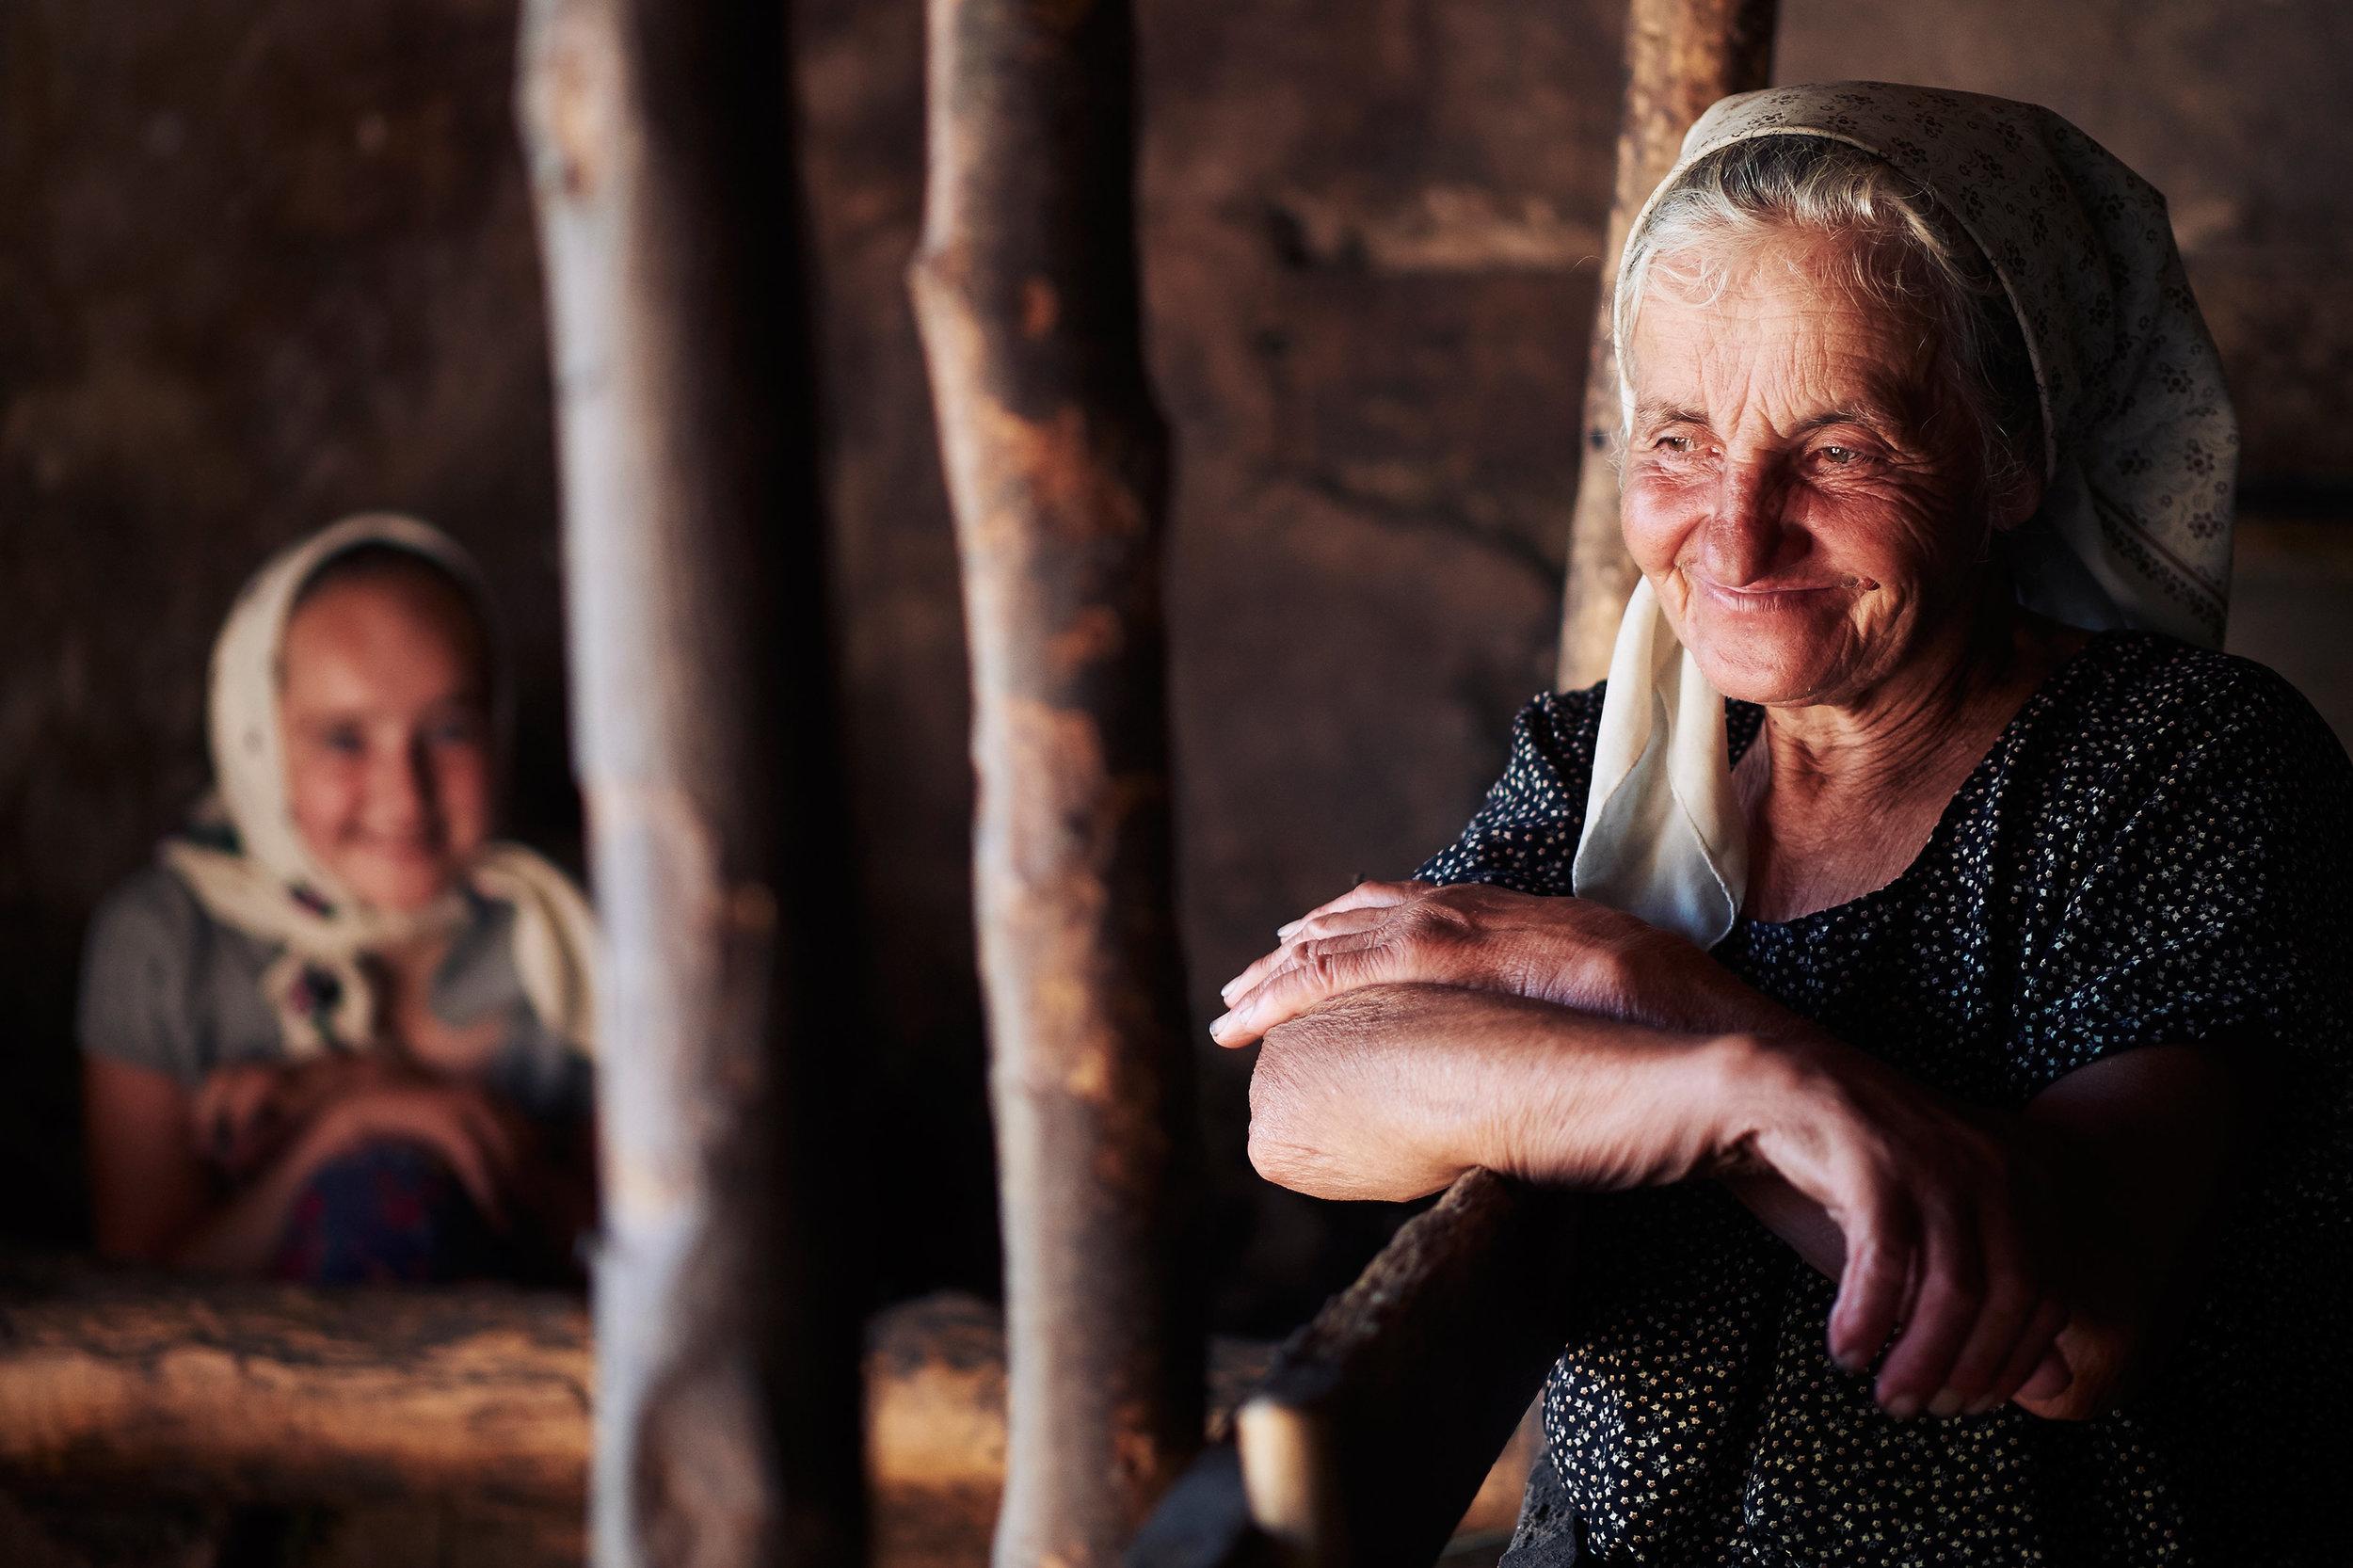 Grandmother-and-granddaughter-portrait-Maramures-Romania